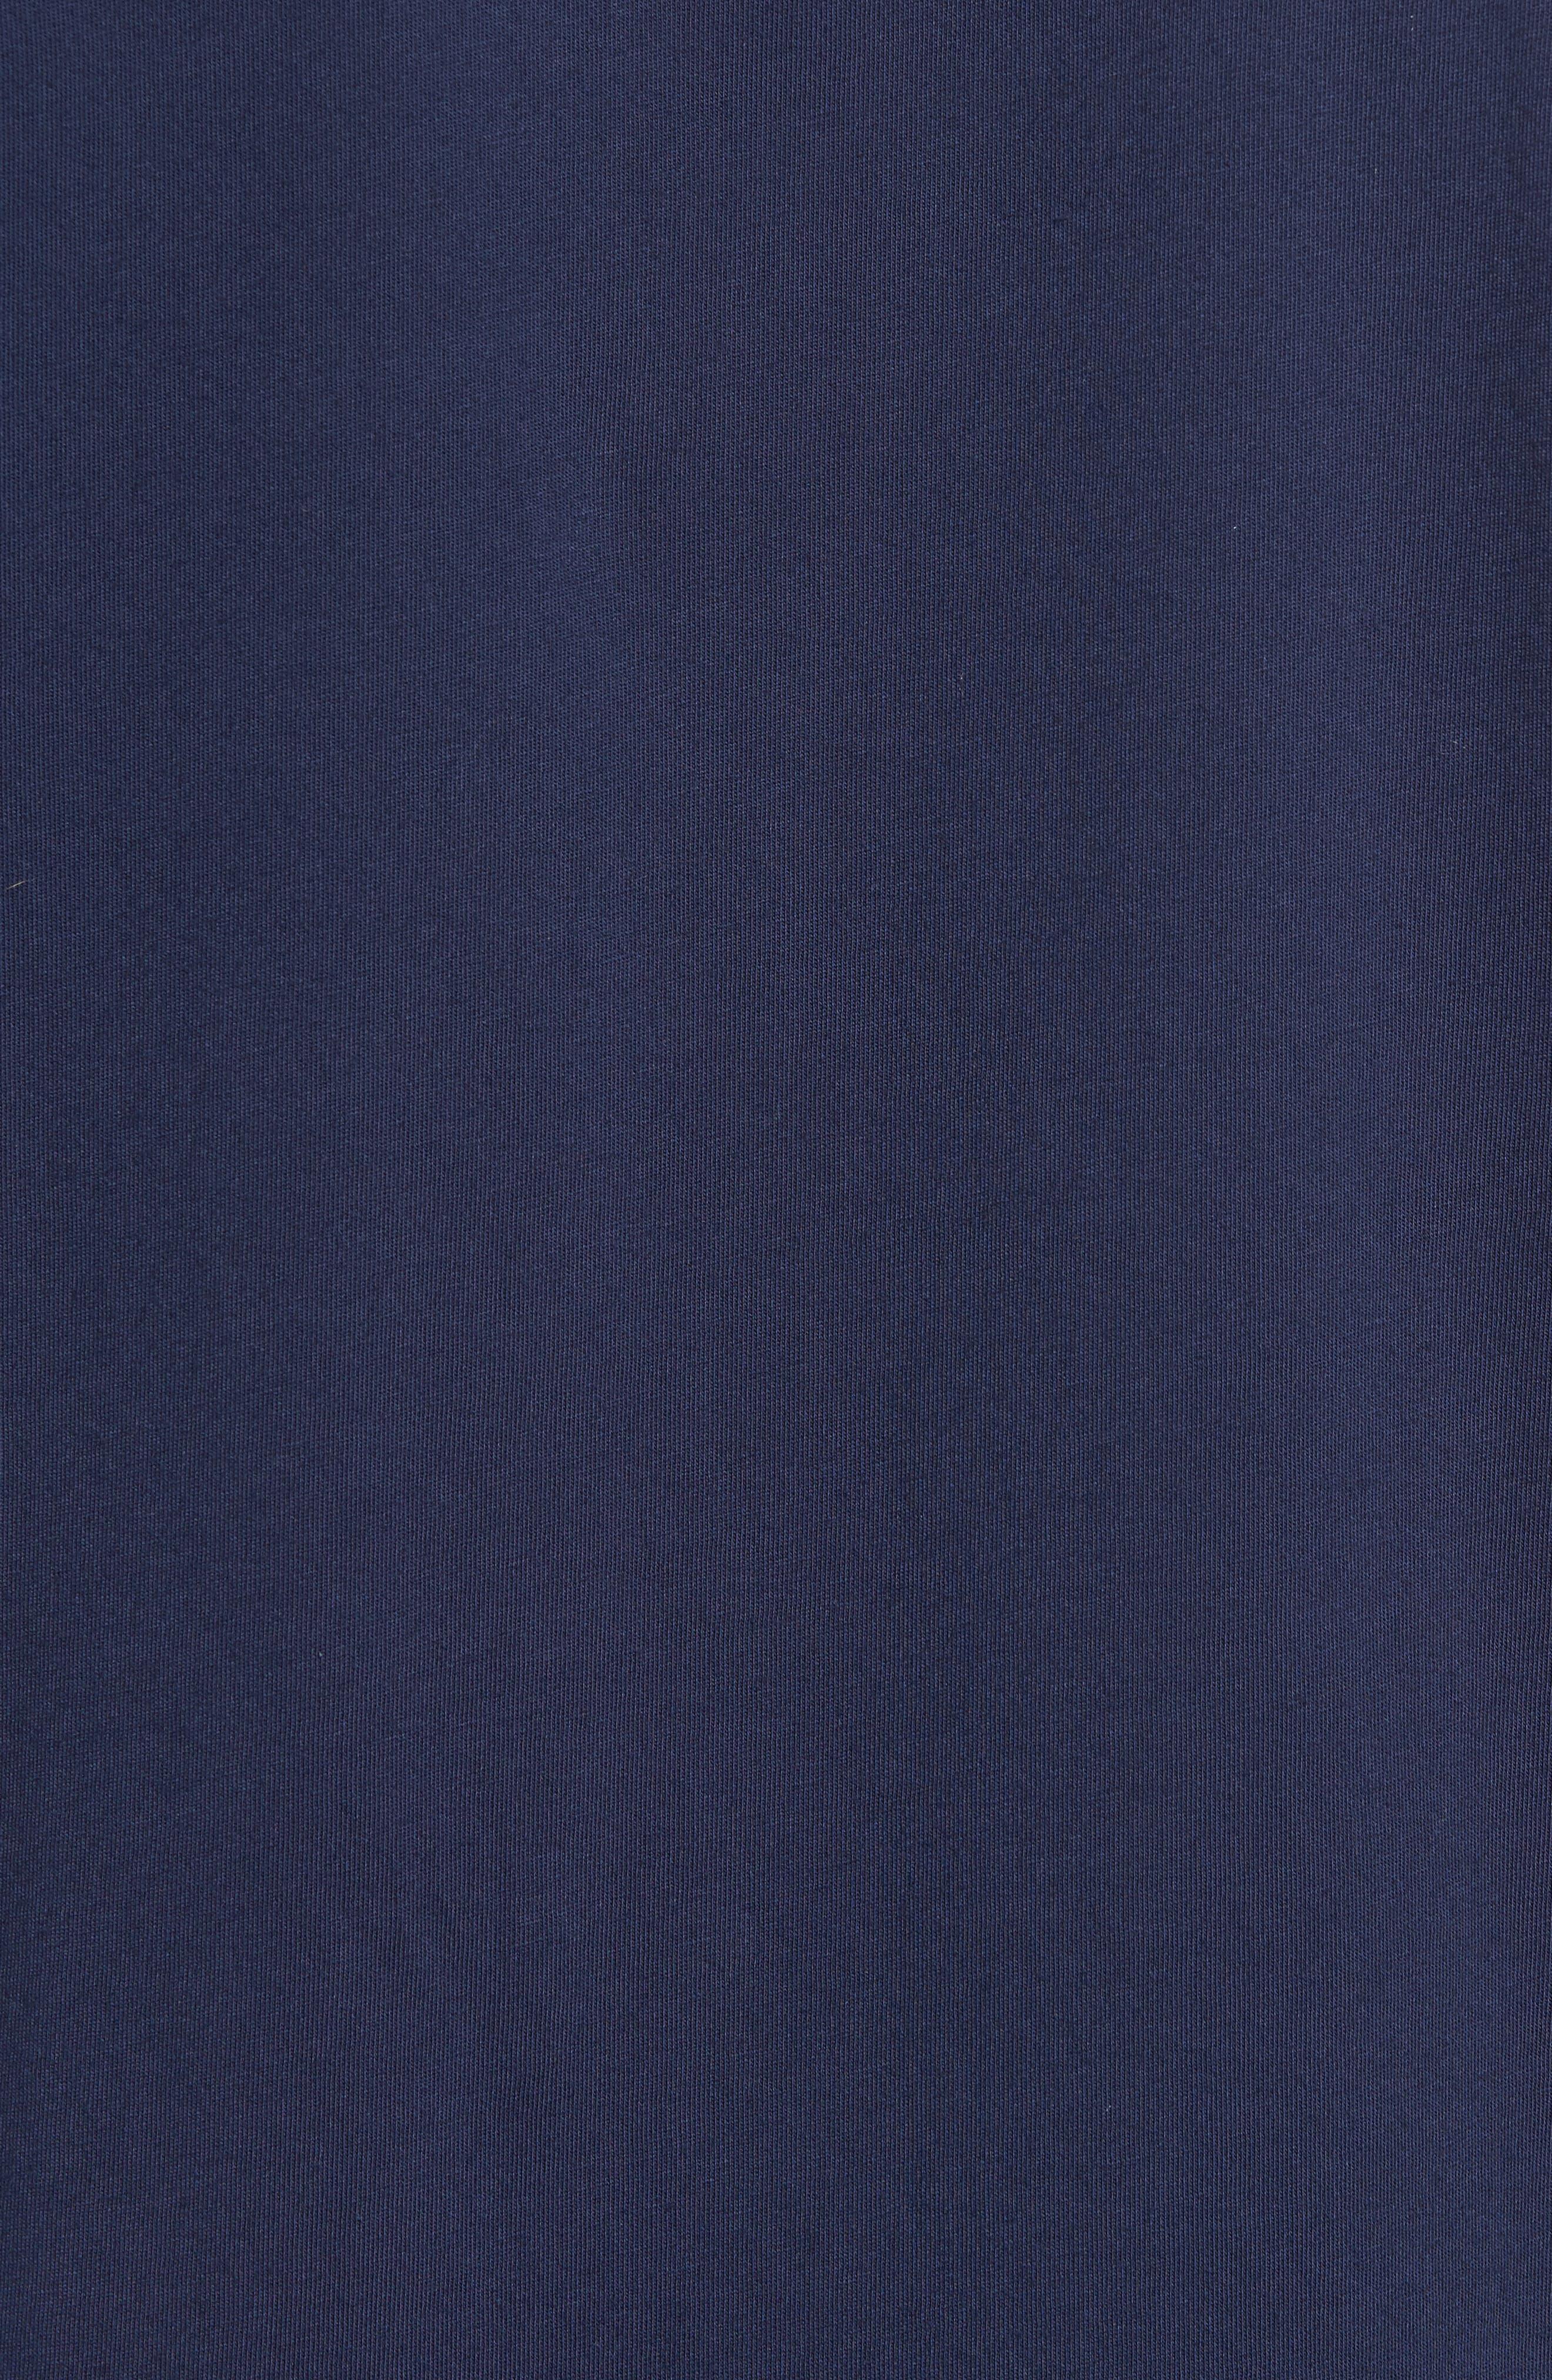 Spinnaker Bay Sports Fit Crewneck T-Shirt,                             Alternate thumbnail 20, color,